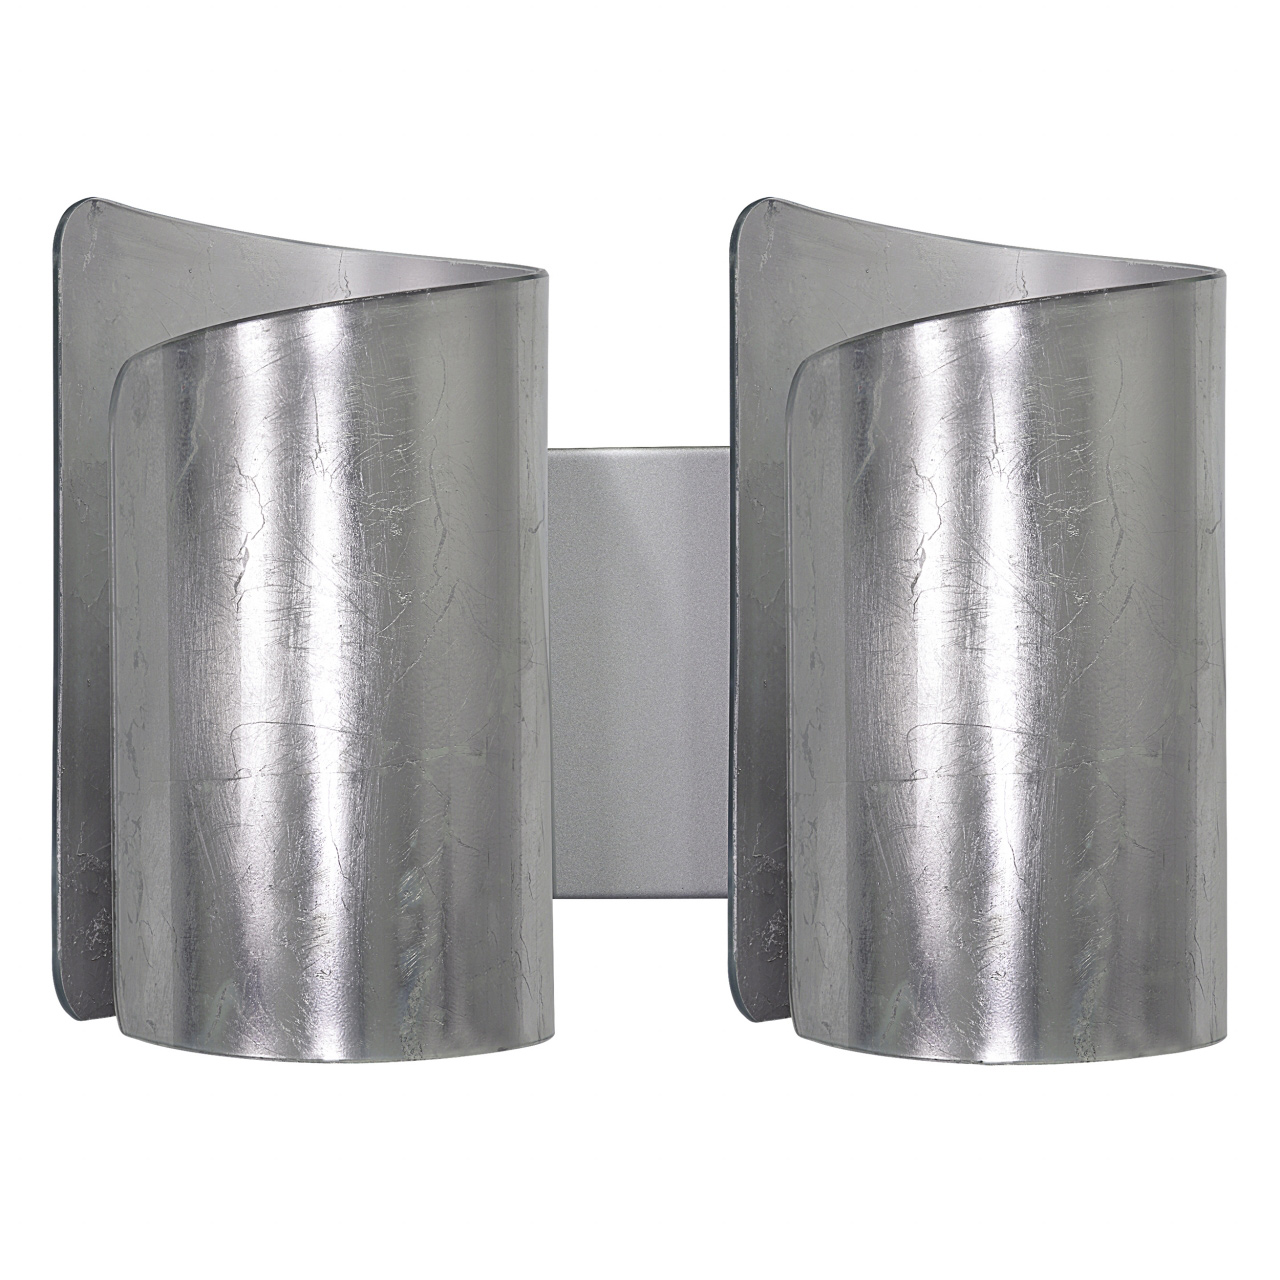 Бра Pittore 2х40W E27 silver Lightstar 811624